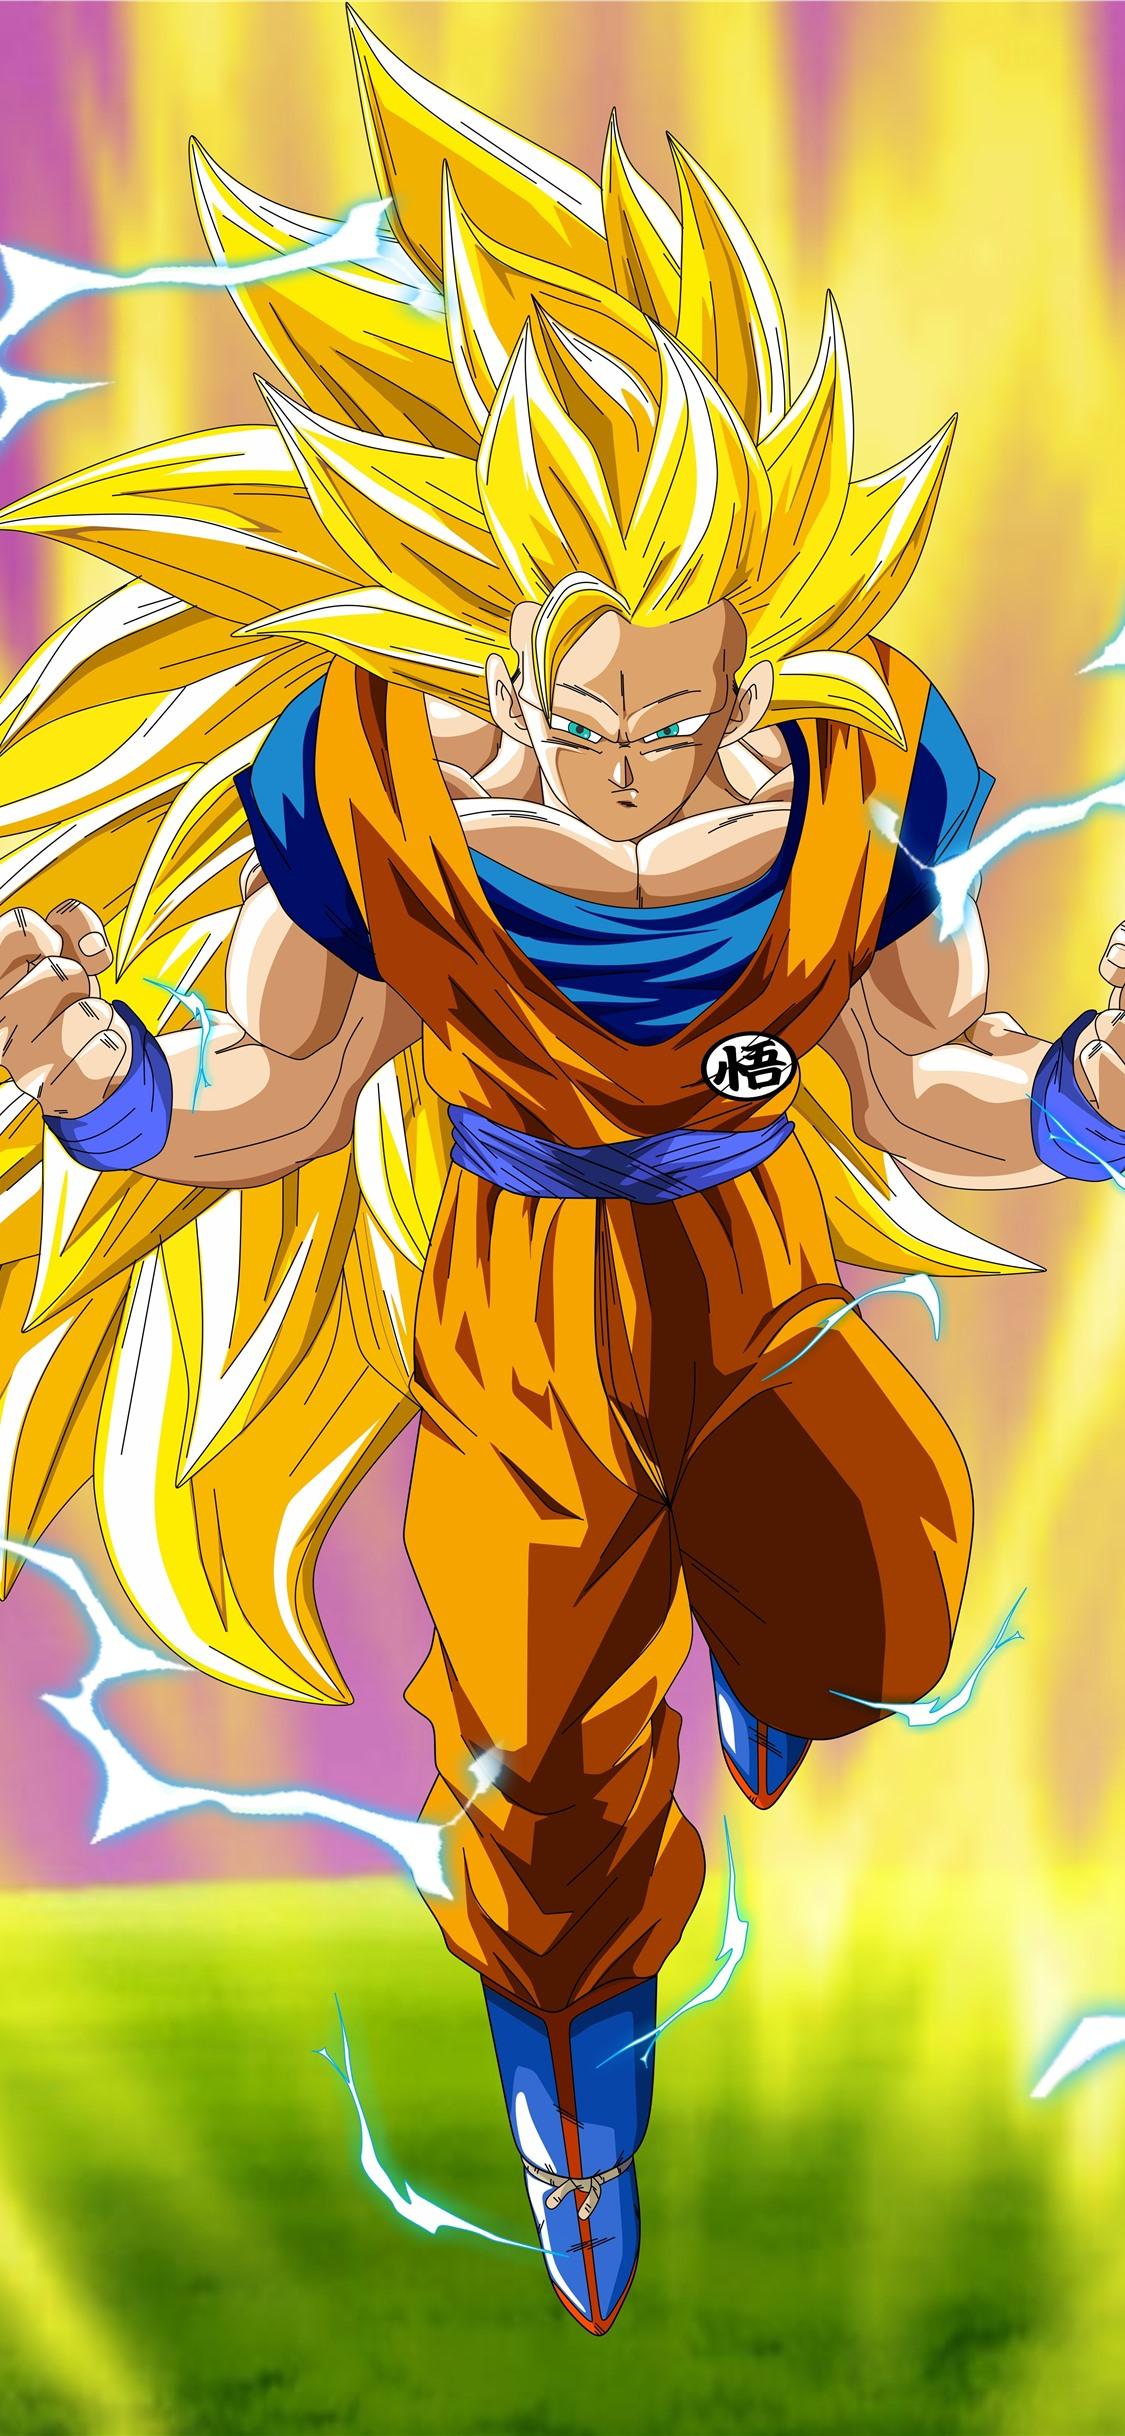 Wallpaper Dragon Ball Super Classic Anime 7680x4320 Uhd 8k Picture Image